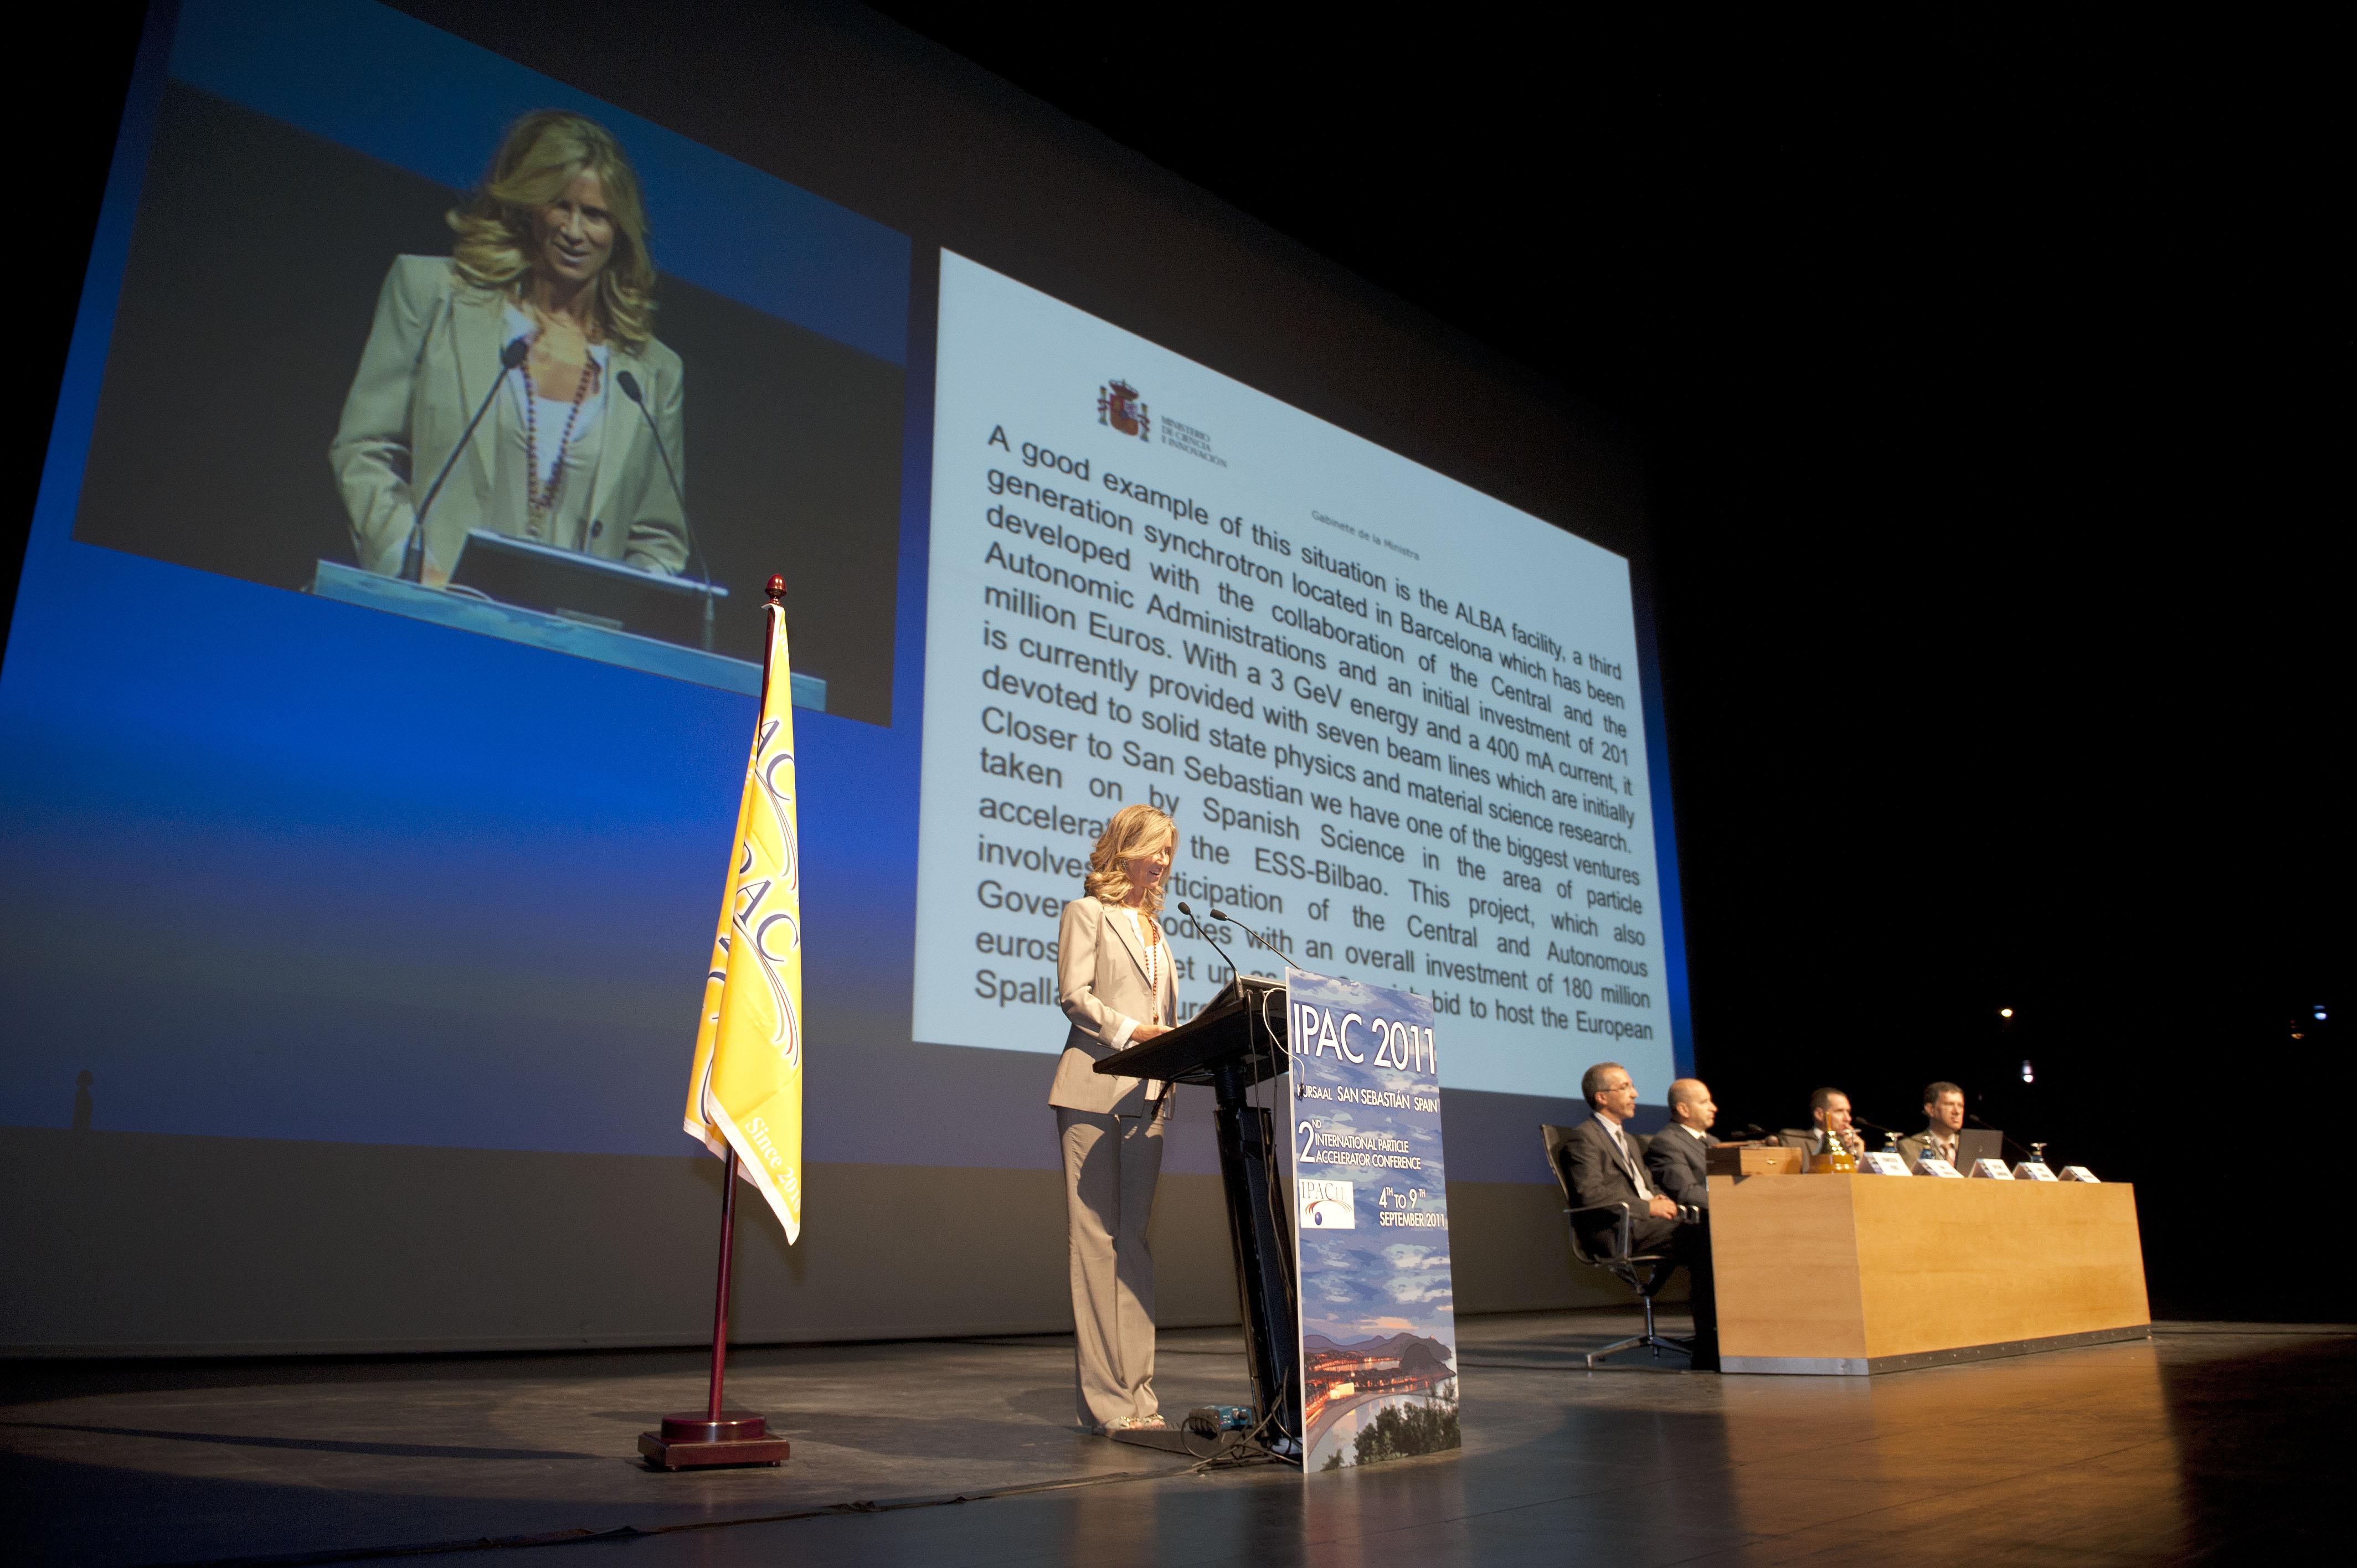 2011_09_05_industria_conferencia_acelerador_ministra_garmendia.jpg